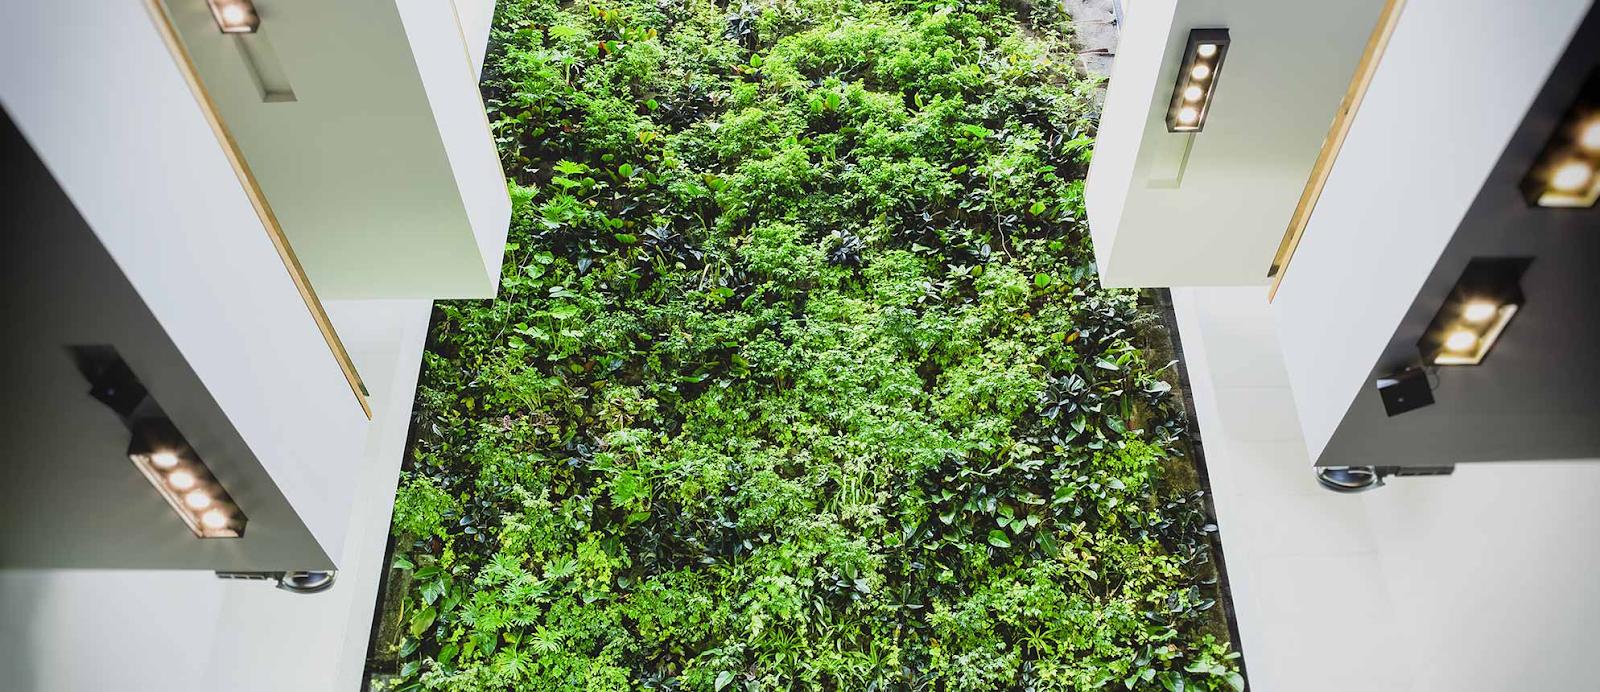 Green wall at Univ. of Guelph